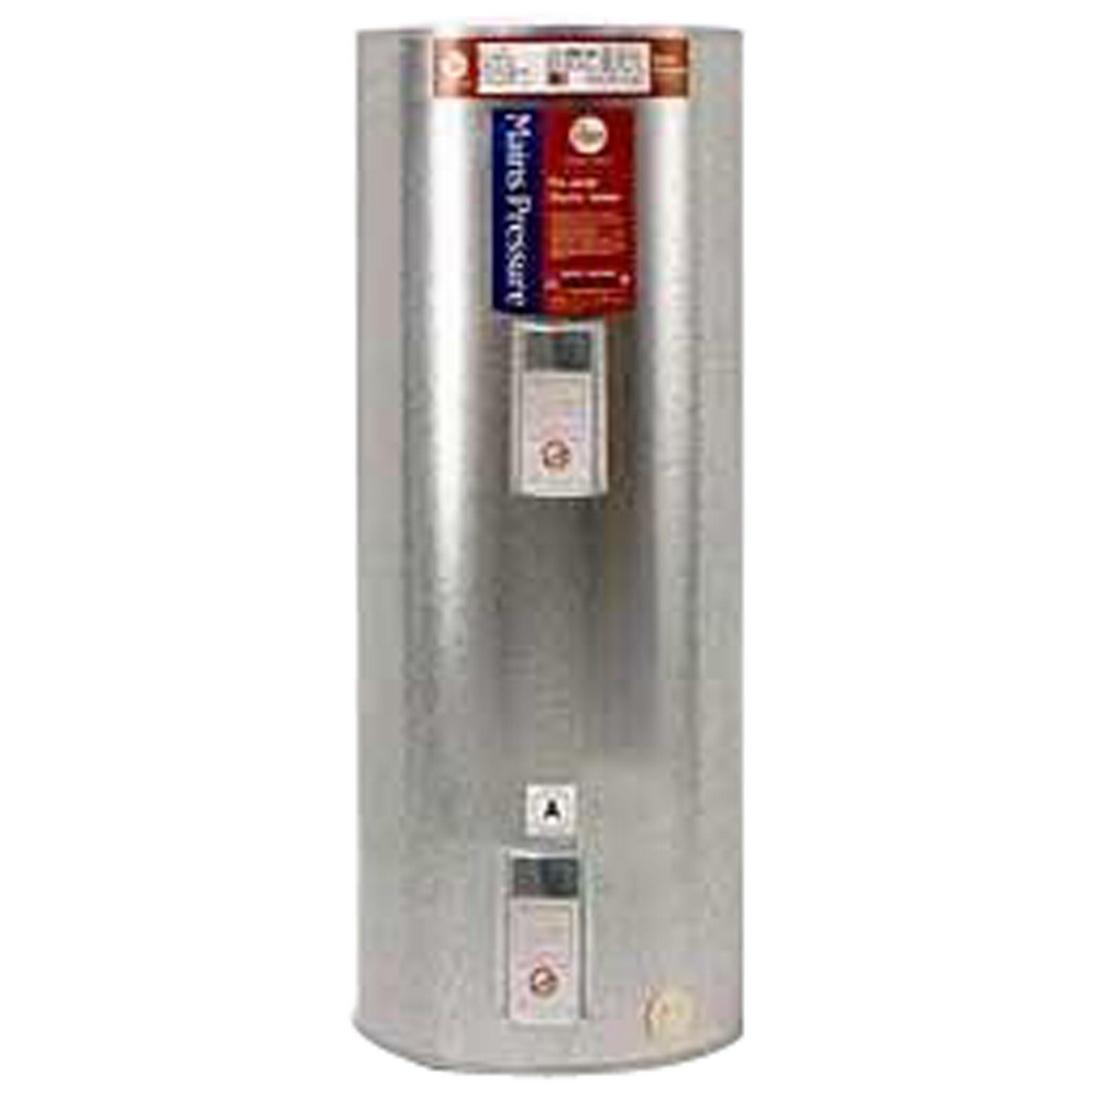 Rheem Hot Water Water Heater 3 kW 180 L 488 x 1720 mm 31218015